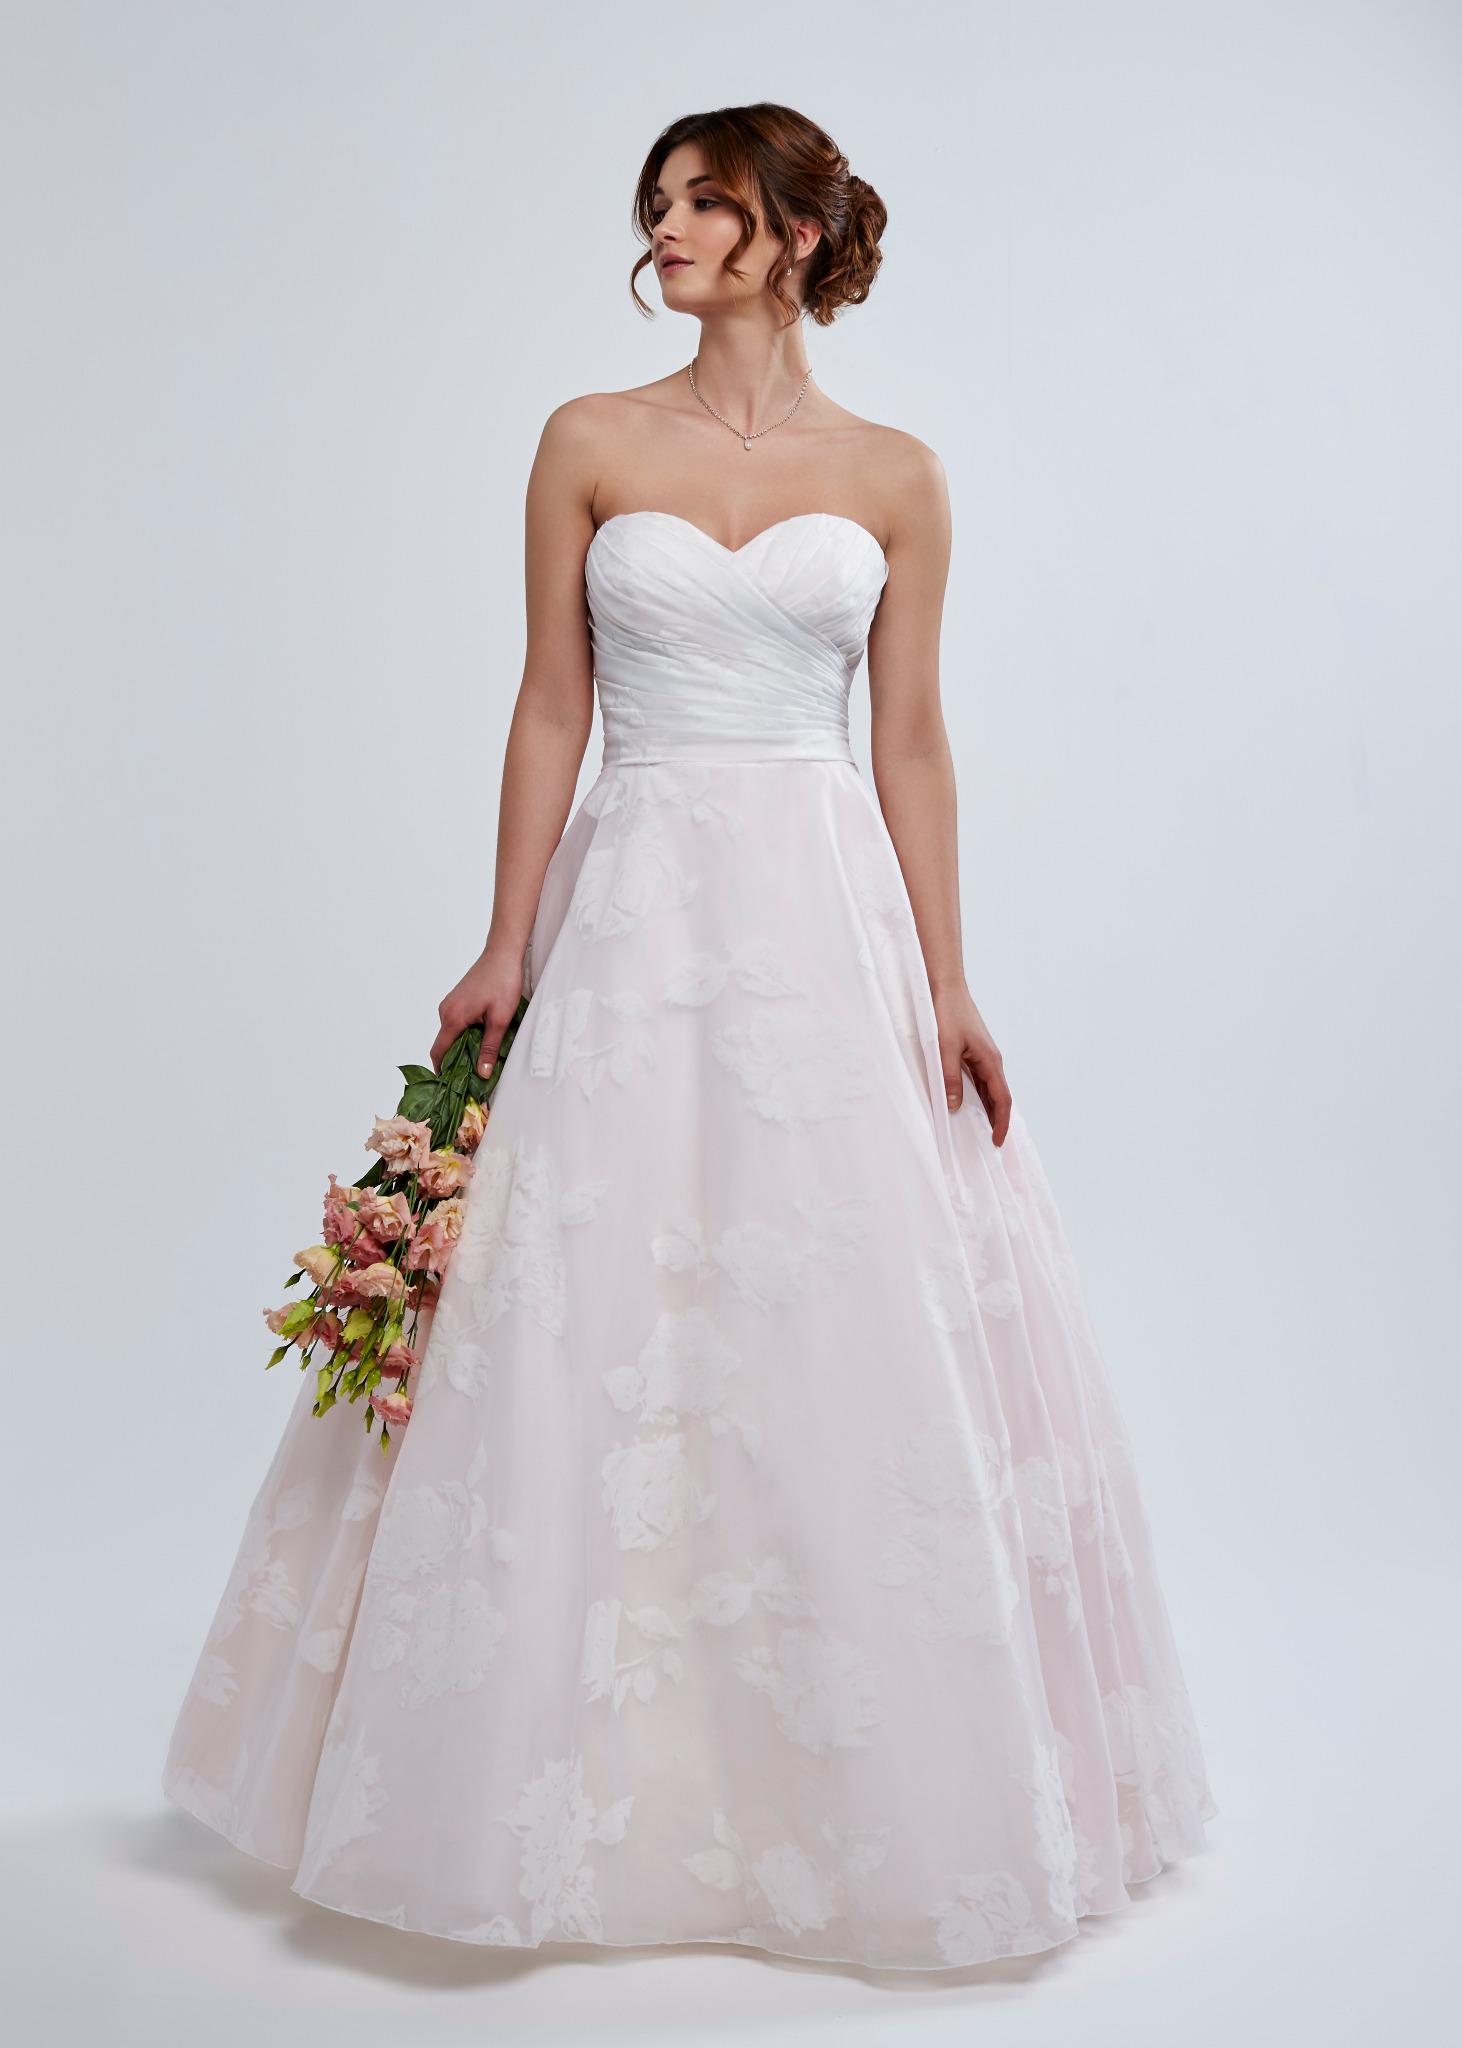 Wedding Time, Dorchester - Buy Stella York, Phil Collins, ball-gown ...